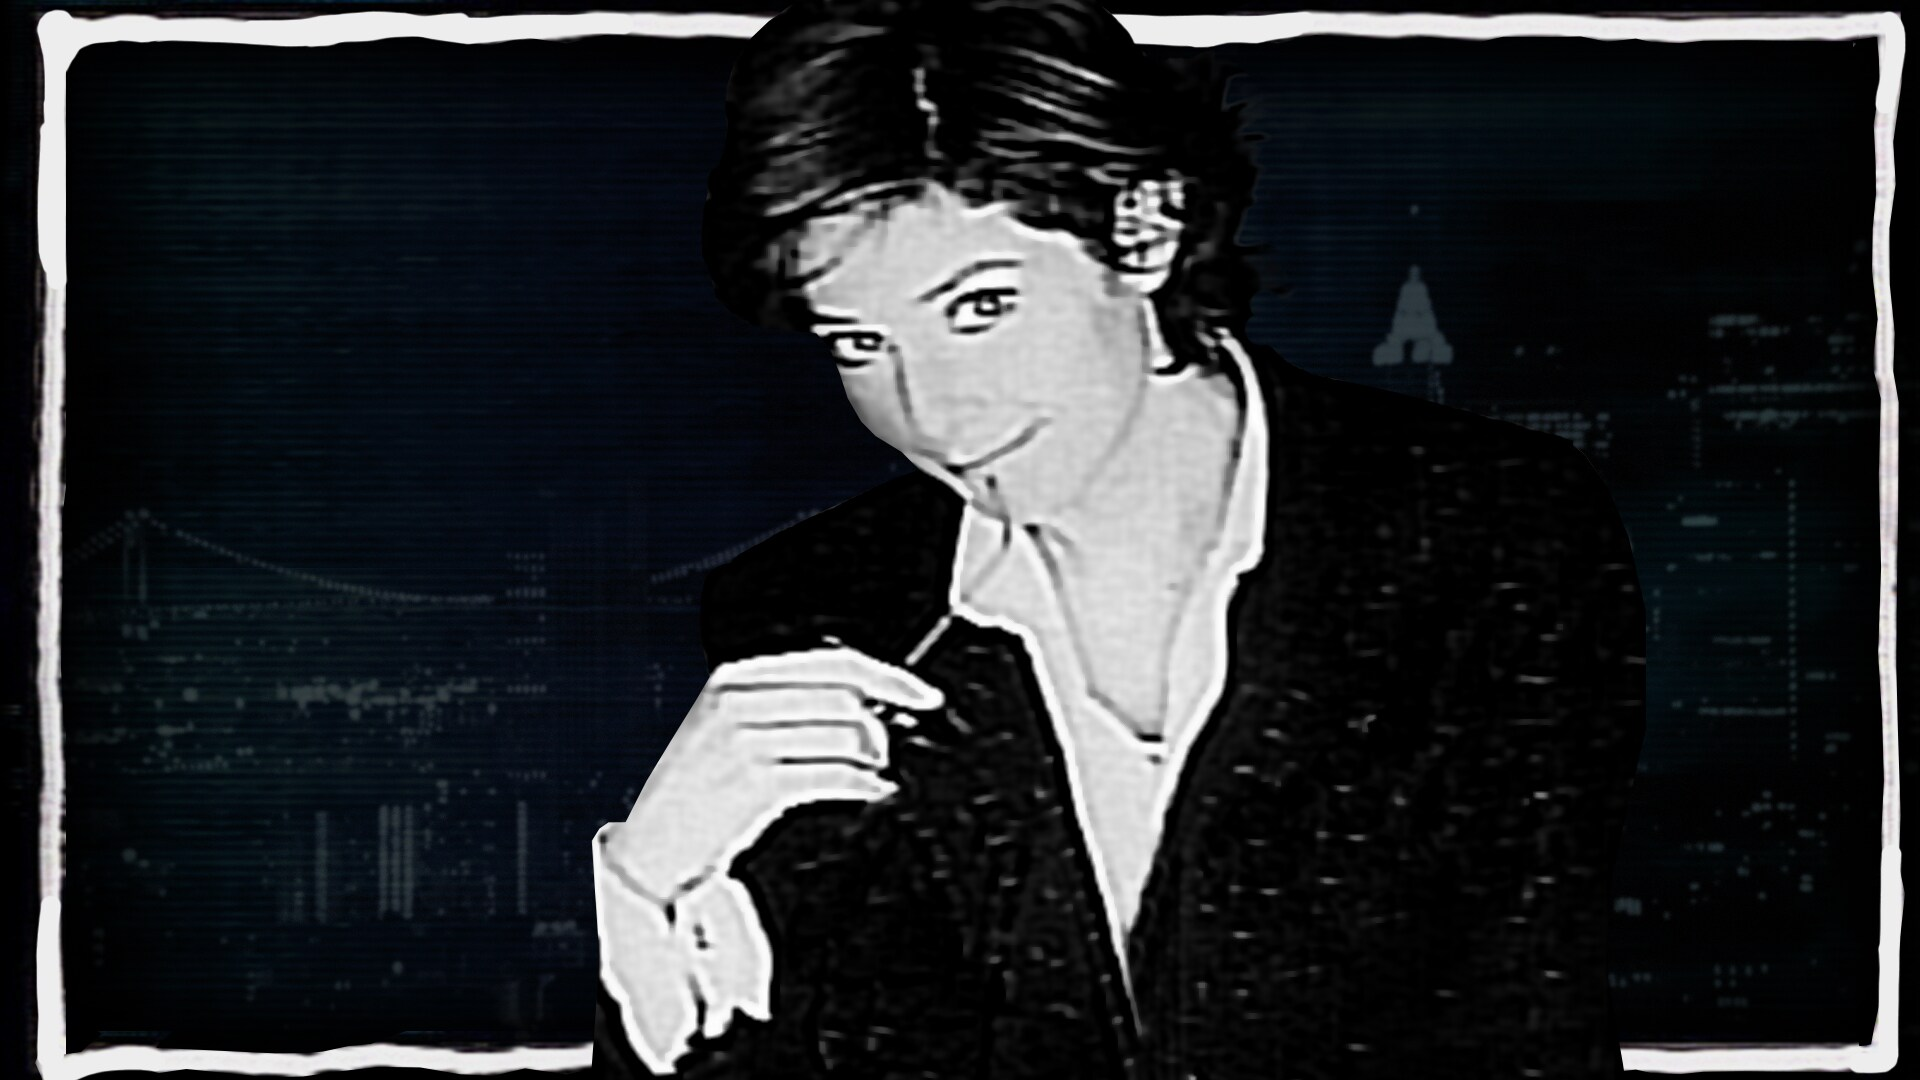 Debra Winger: March 24, 1990